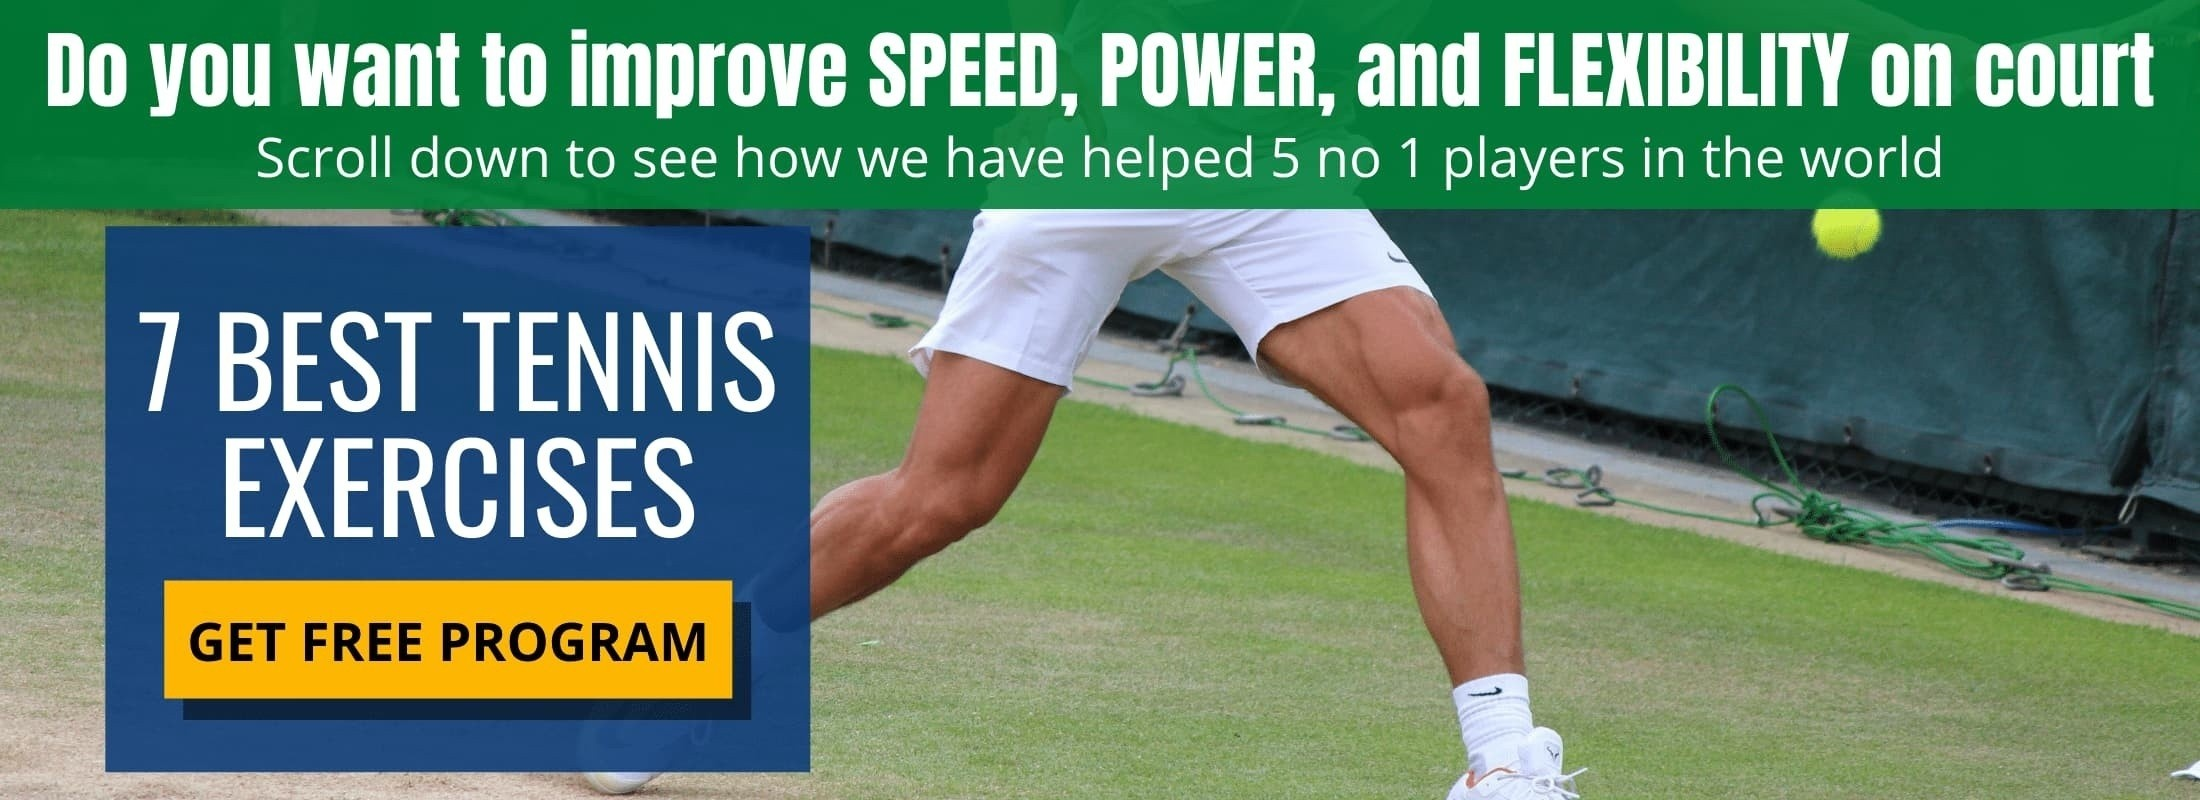 tennis-workout-program